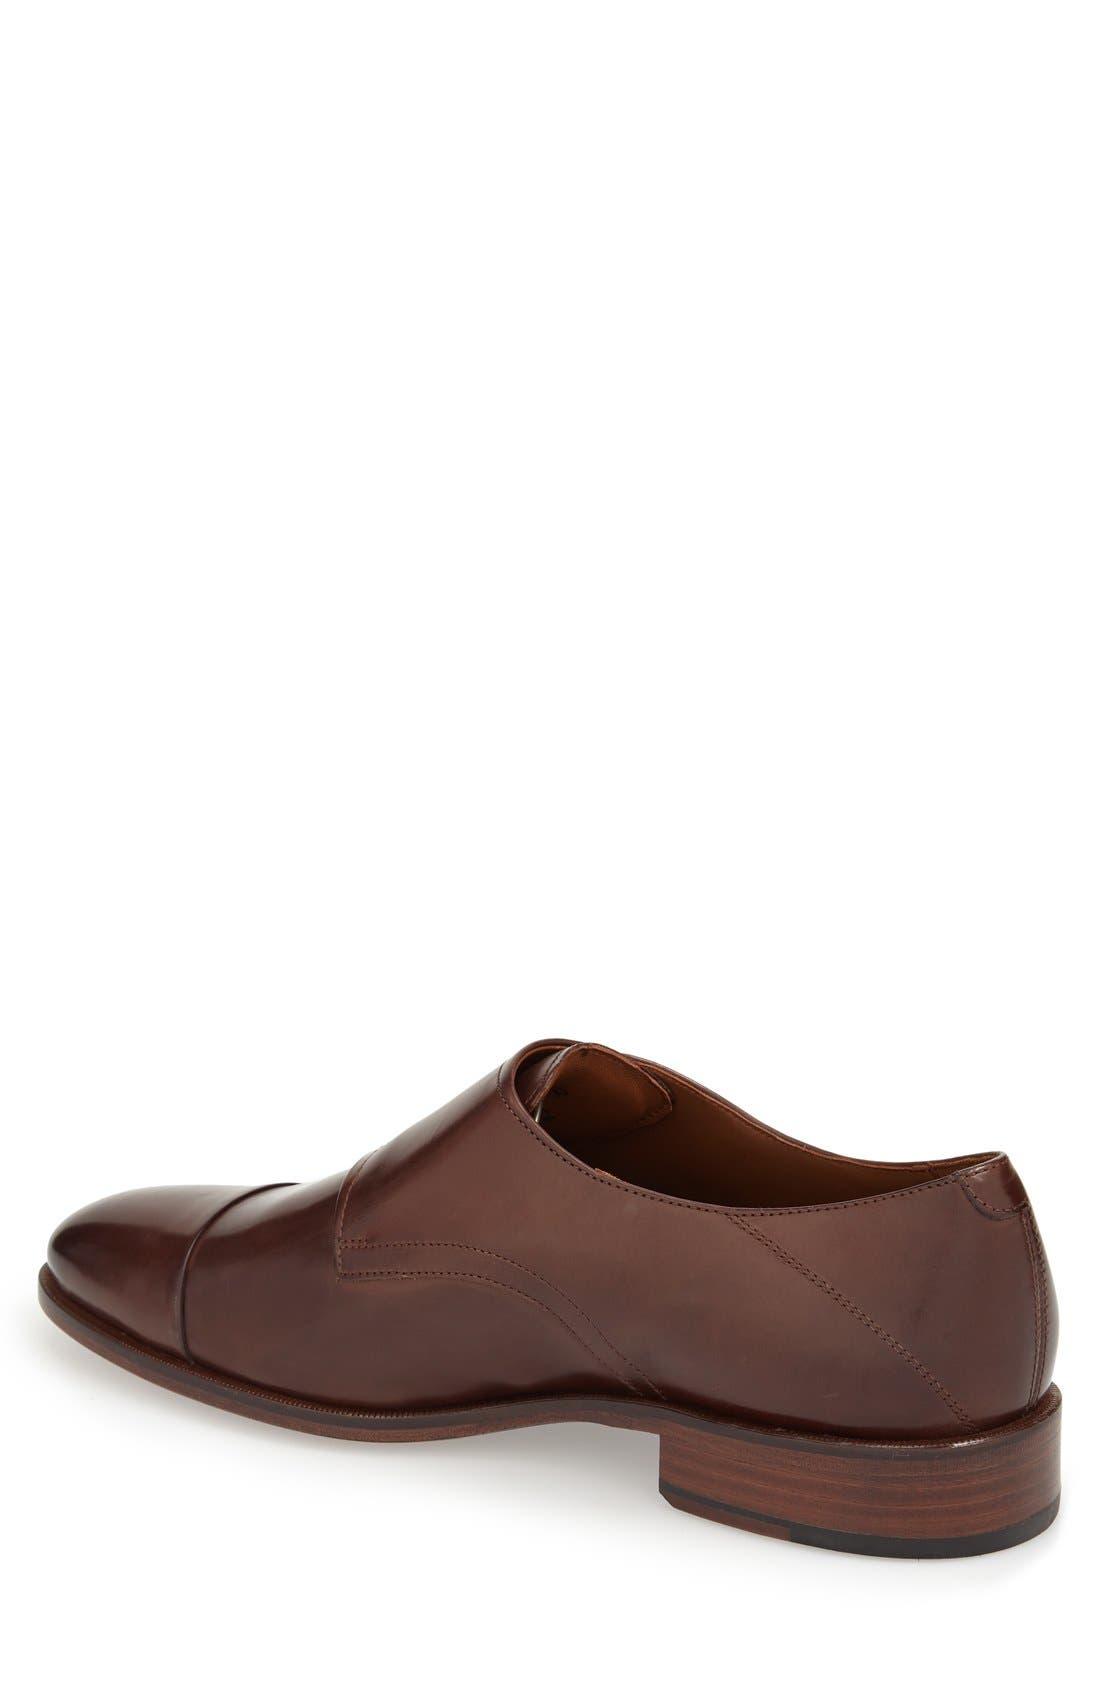 Alternate Image 2  - Johnston & Murphy 'Nolen' Double Monk Strap Shoe (Men)